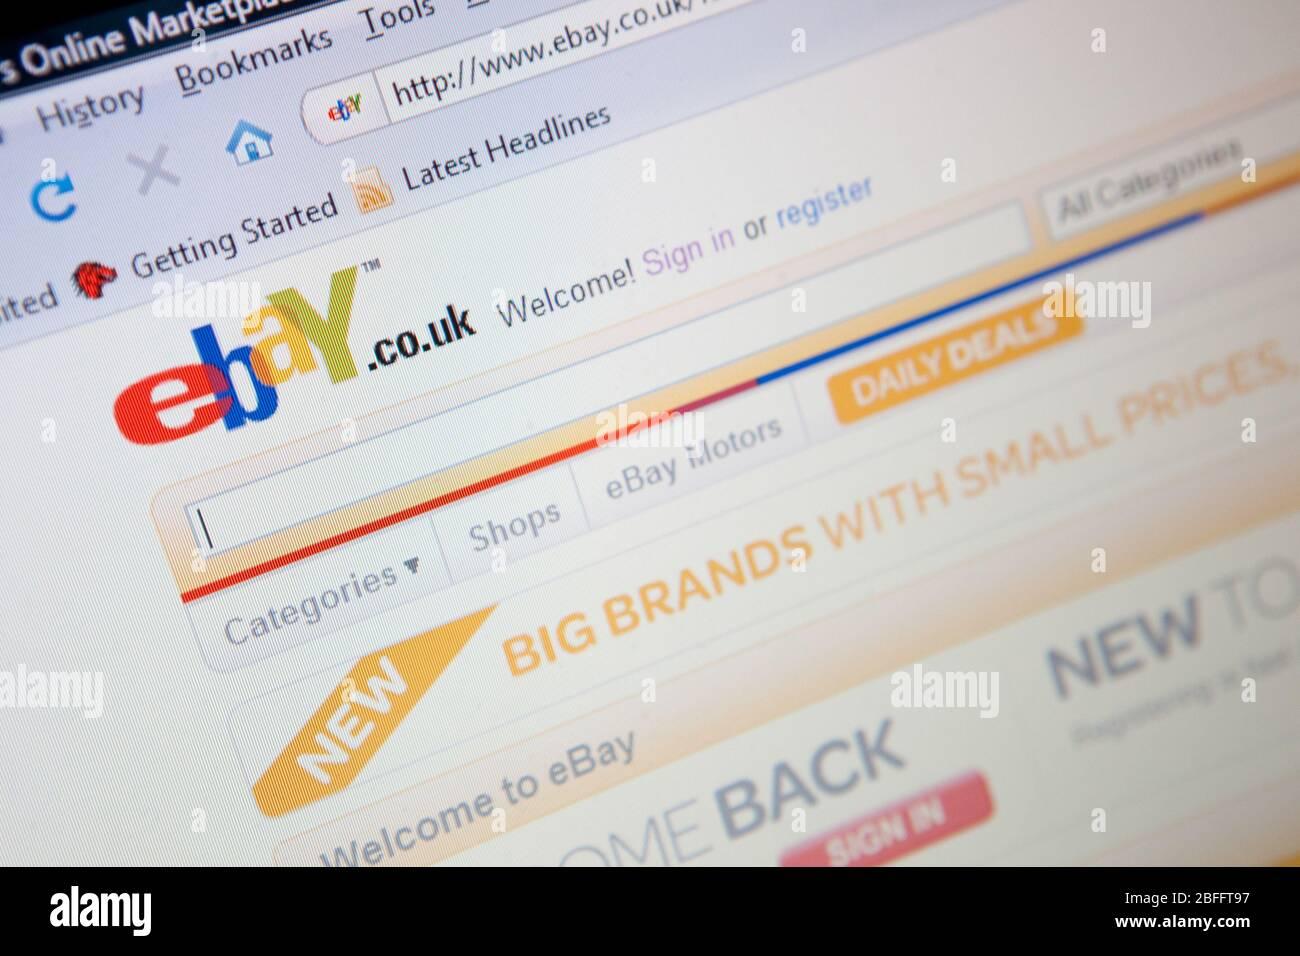 Illustrative Image Of The Ebay Website Stock Photo Alamy